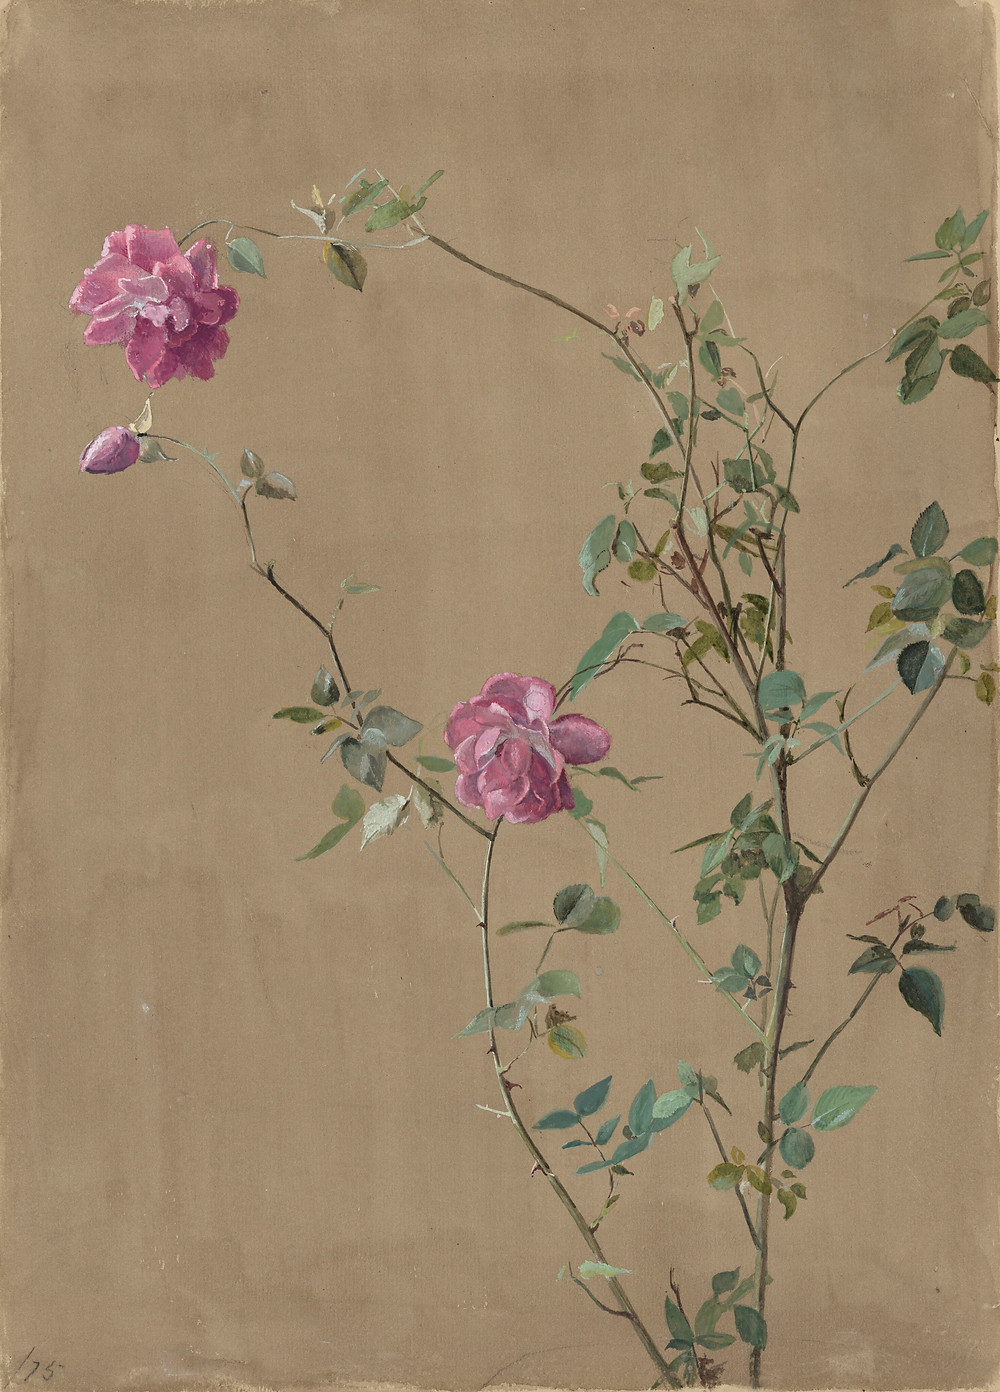 Pink Roses (1875) by Fidelia Bridges (1834 - 1923)